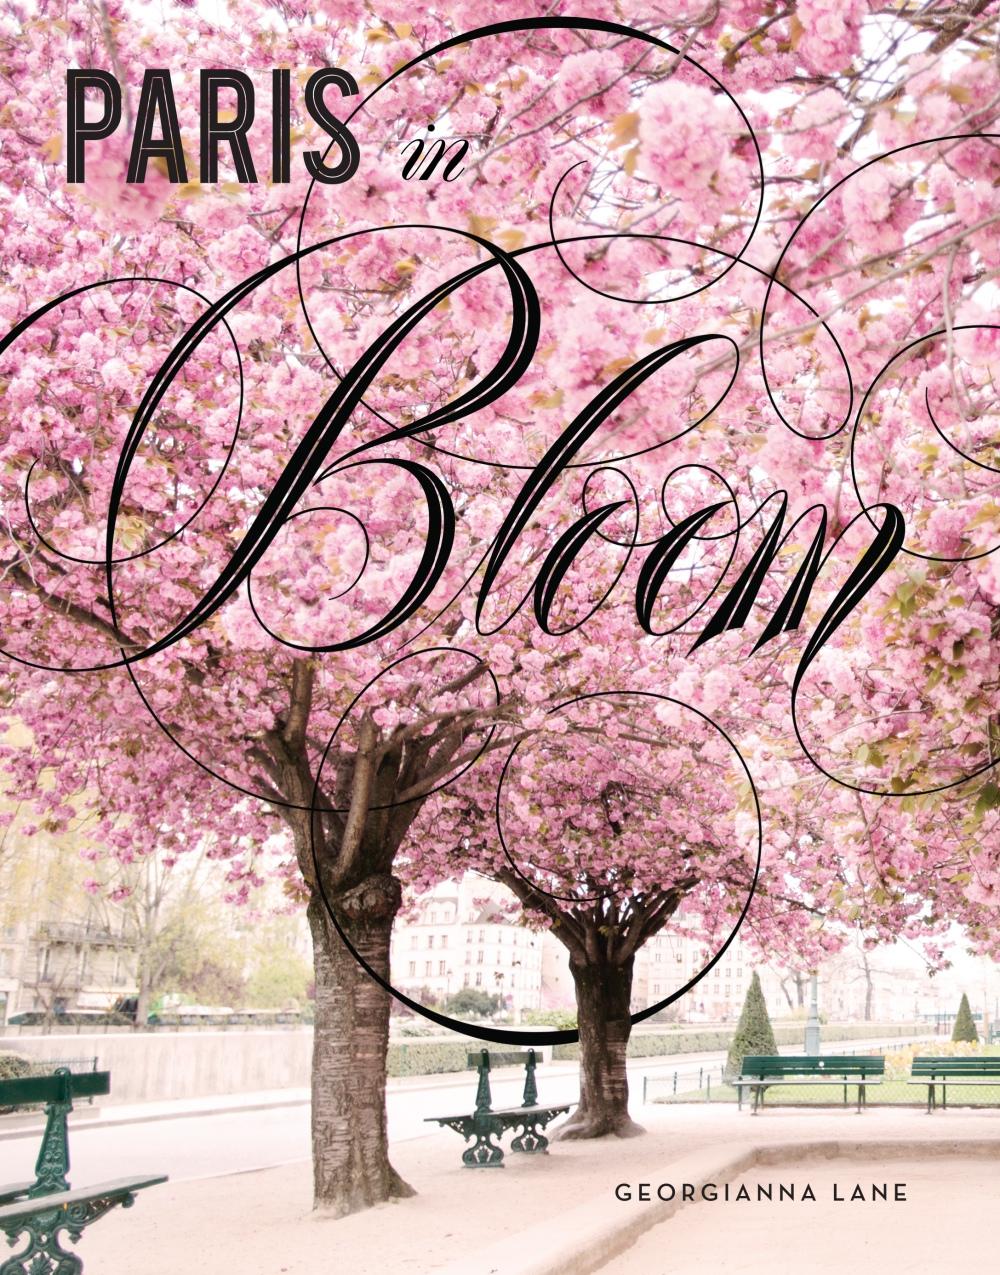 ParisInBloomcover